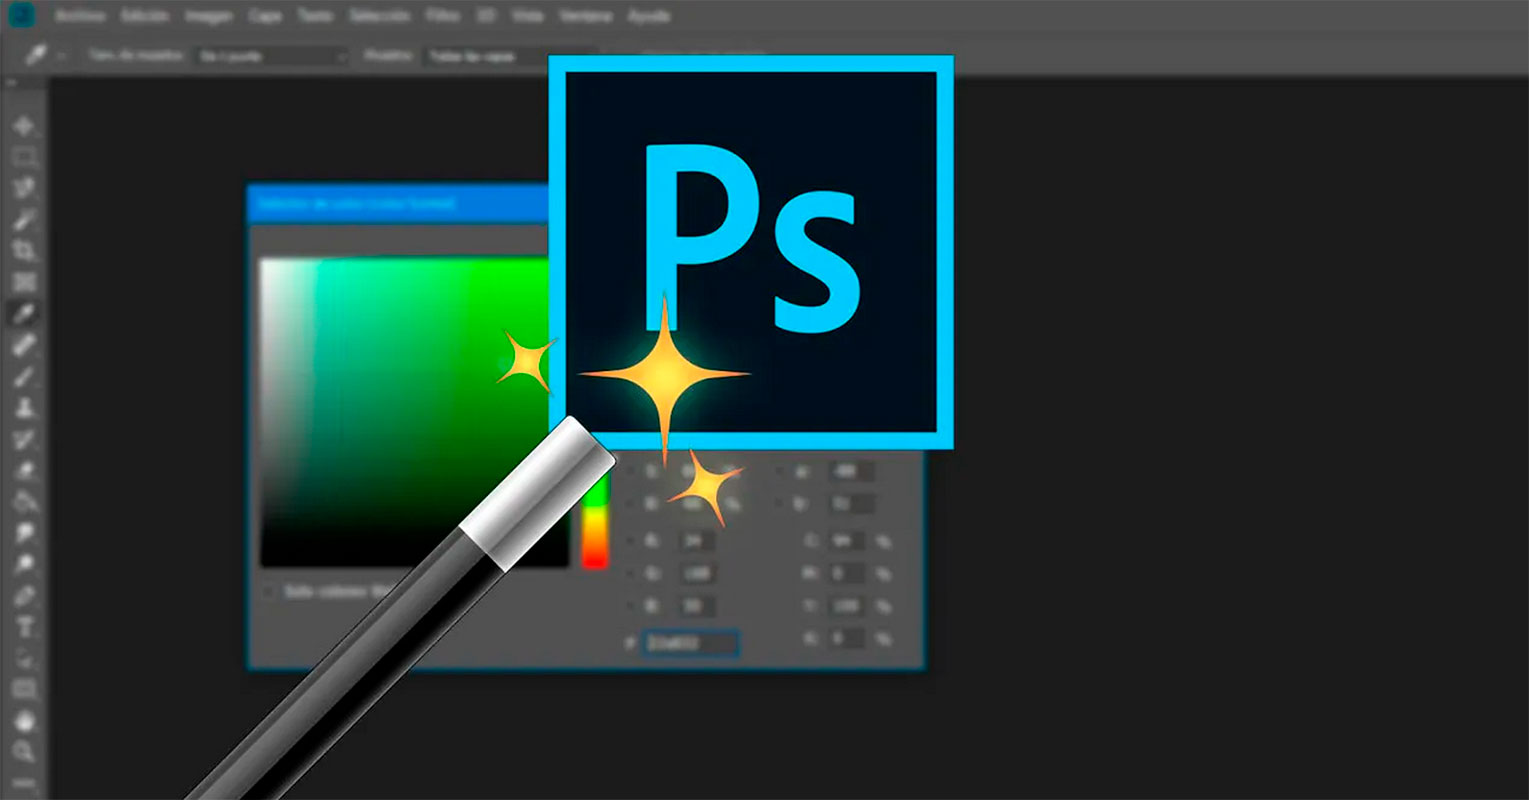 preparar documento photoshop para imprimir